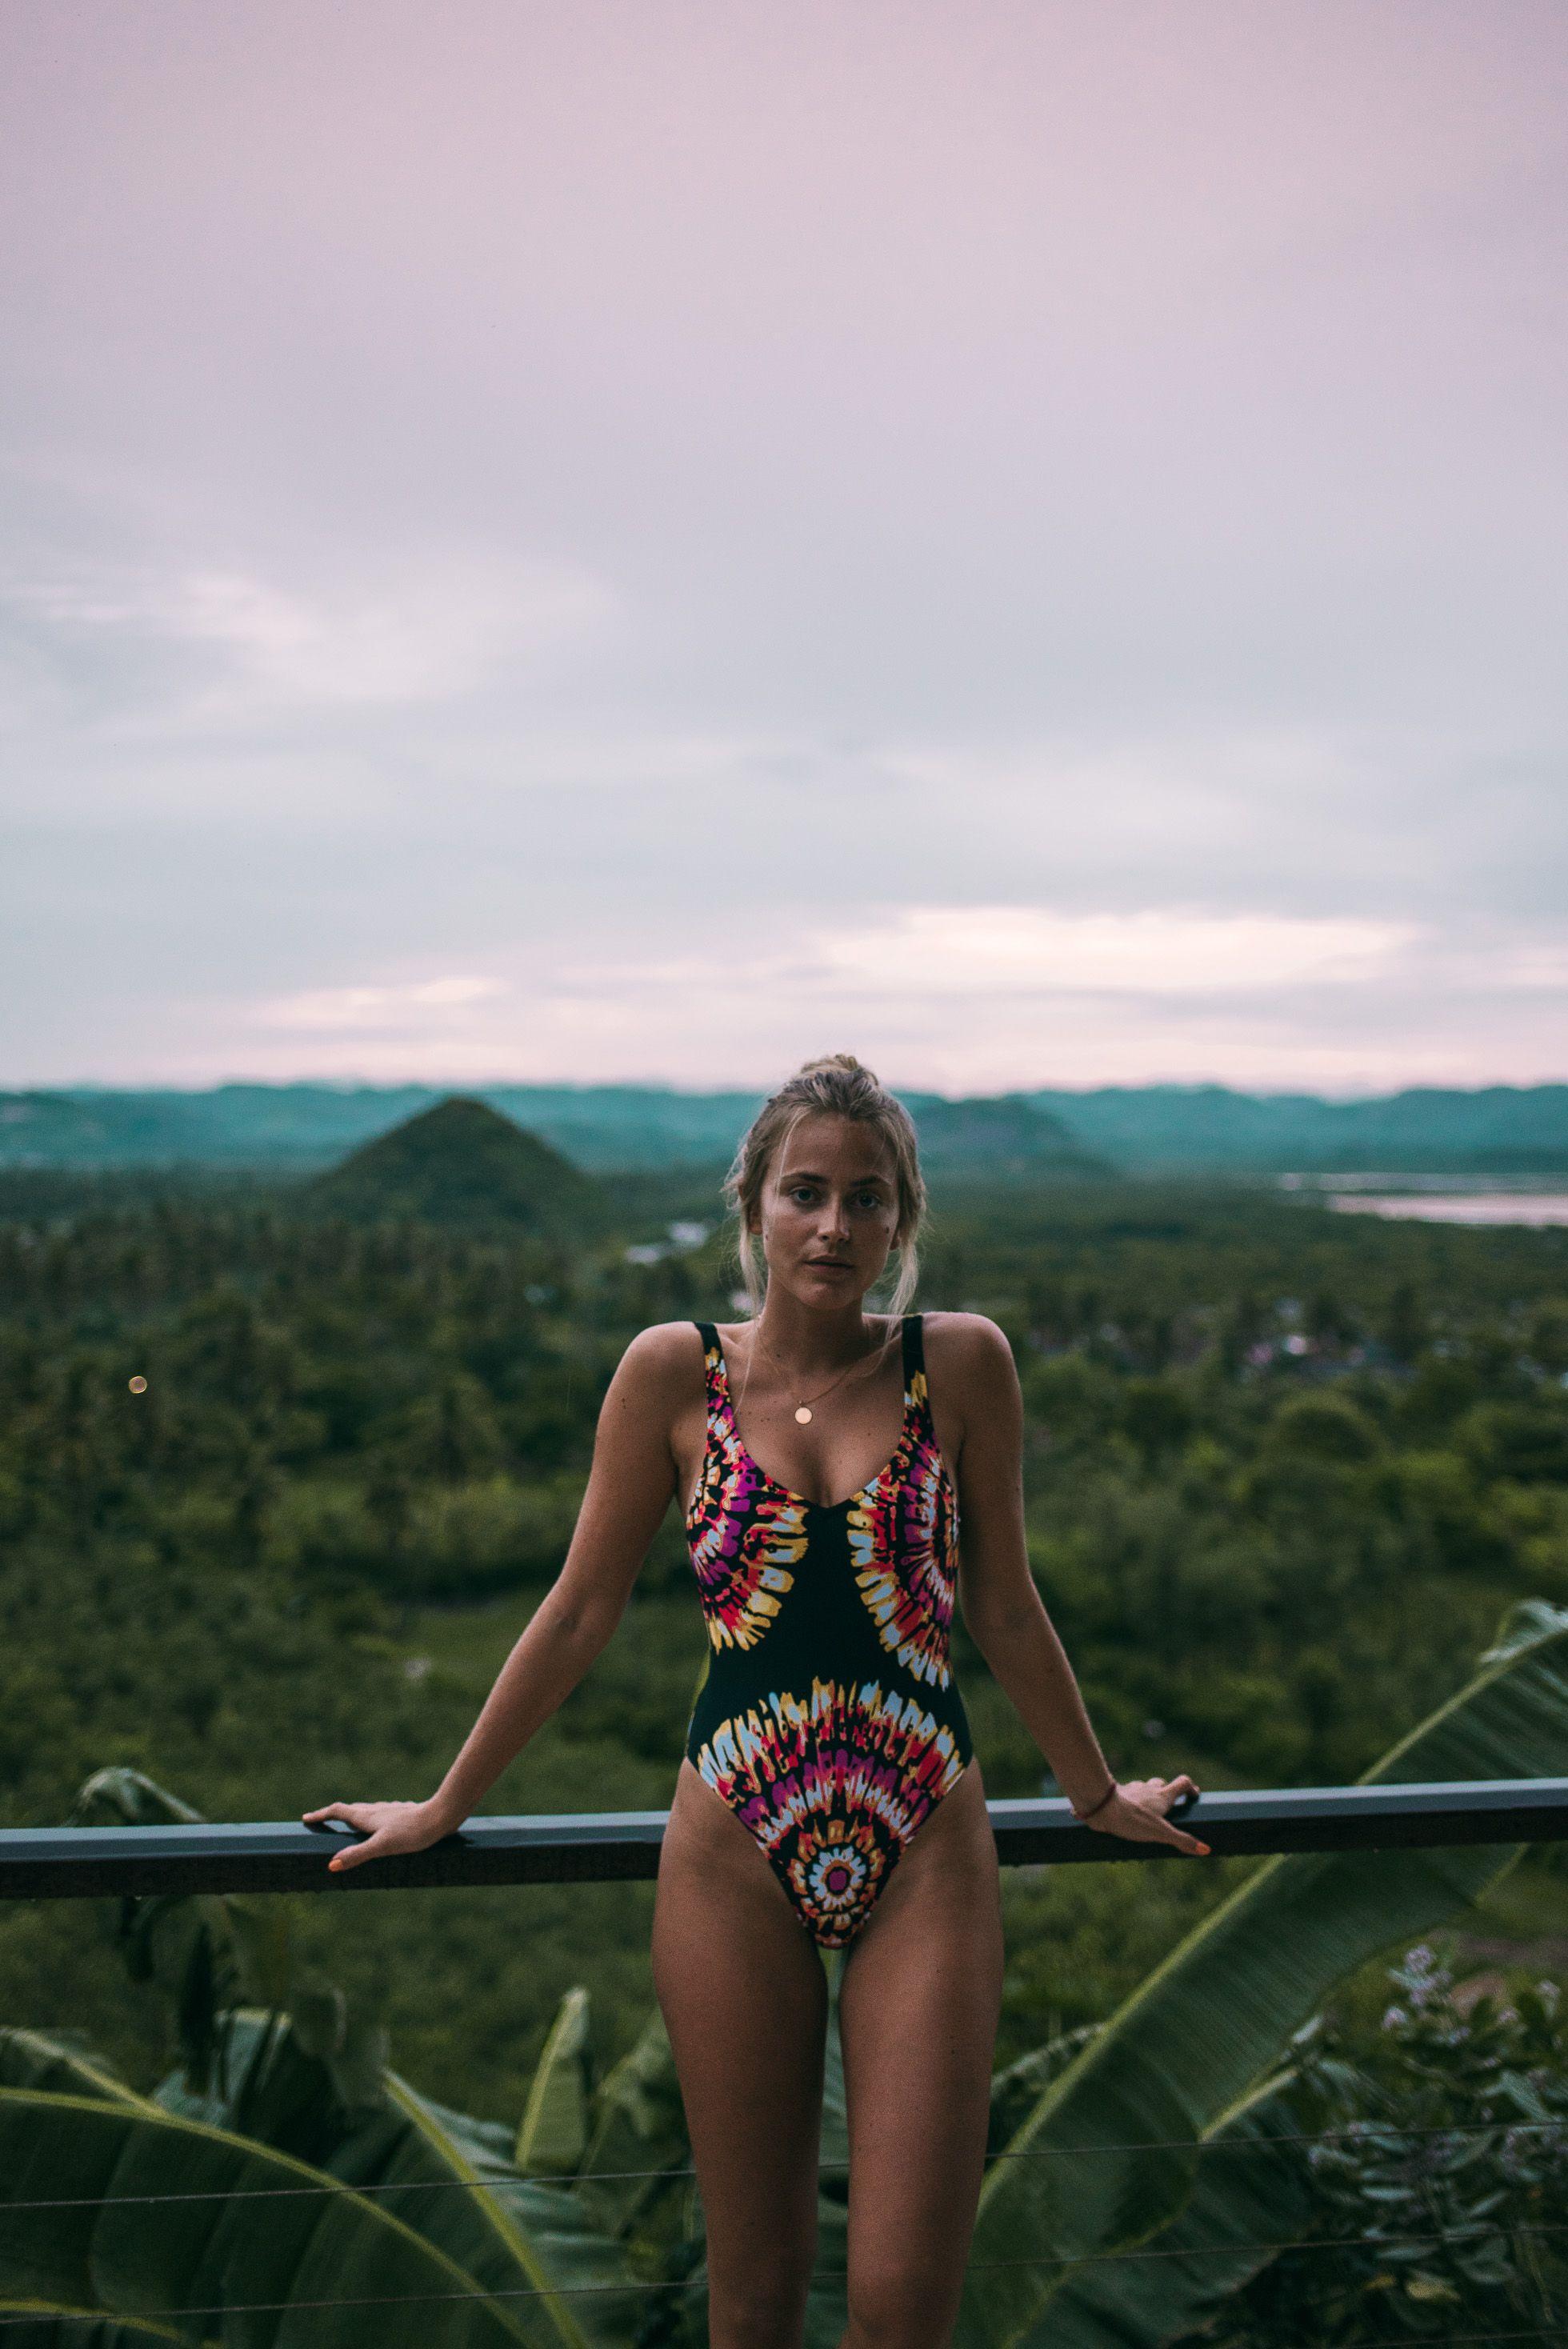 janni delér bikini